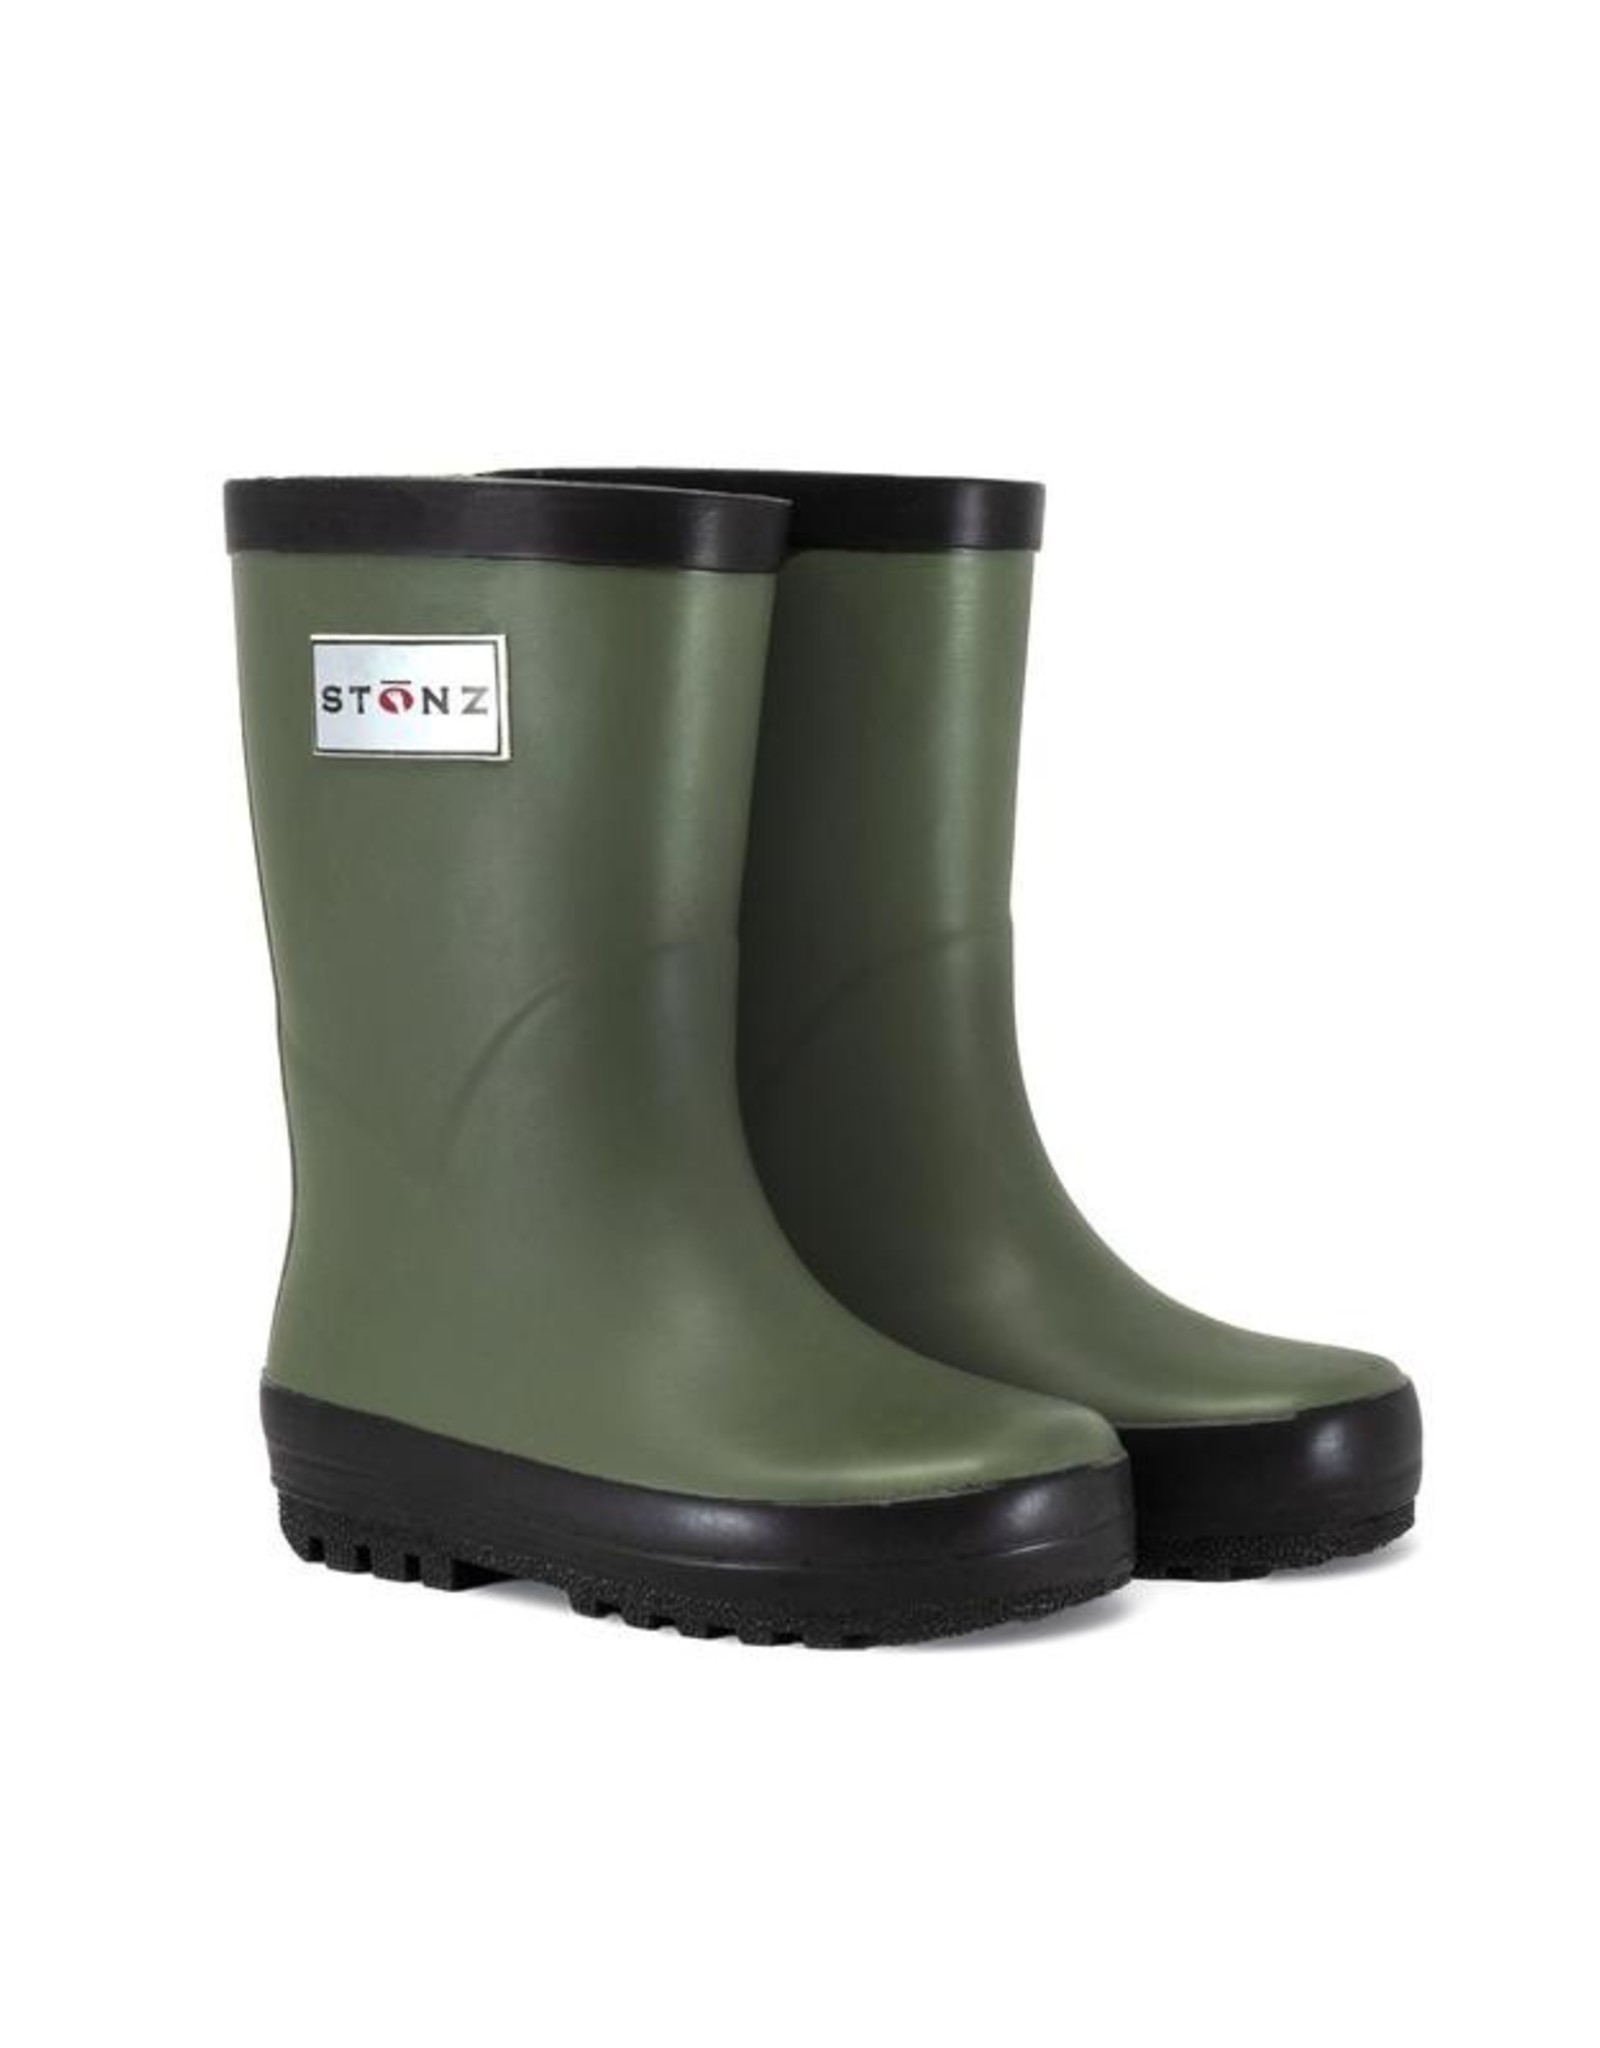 Stonz FA21 Rain Boot - Assorted